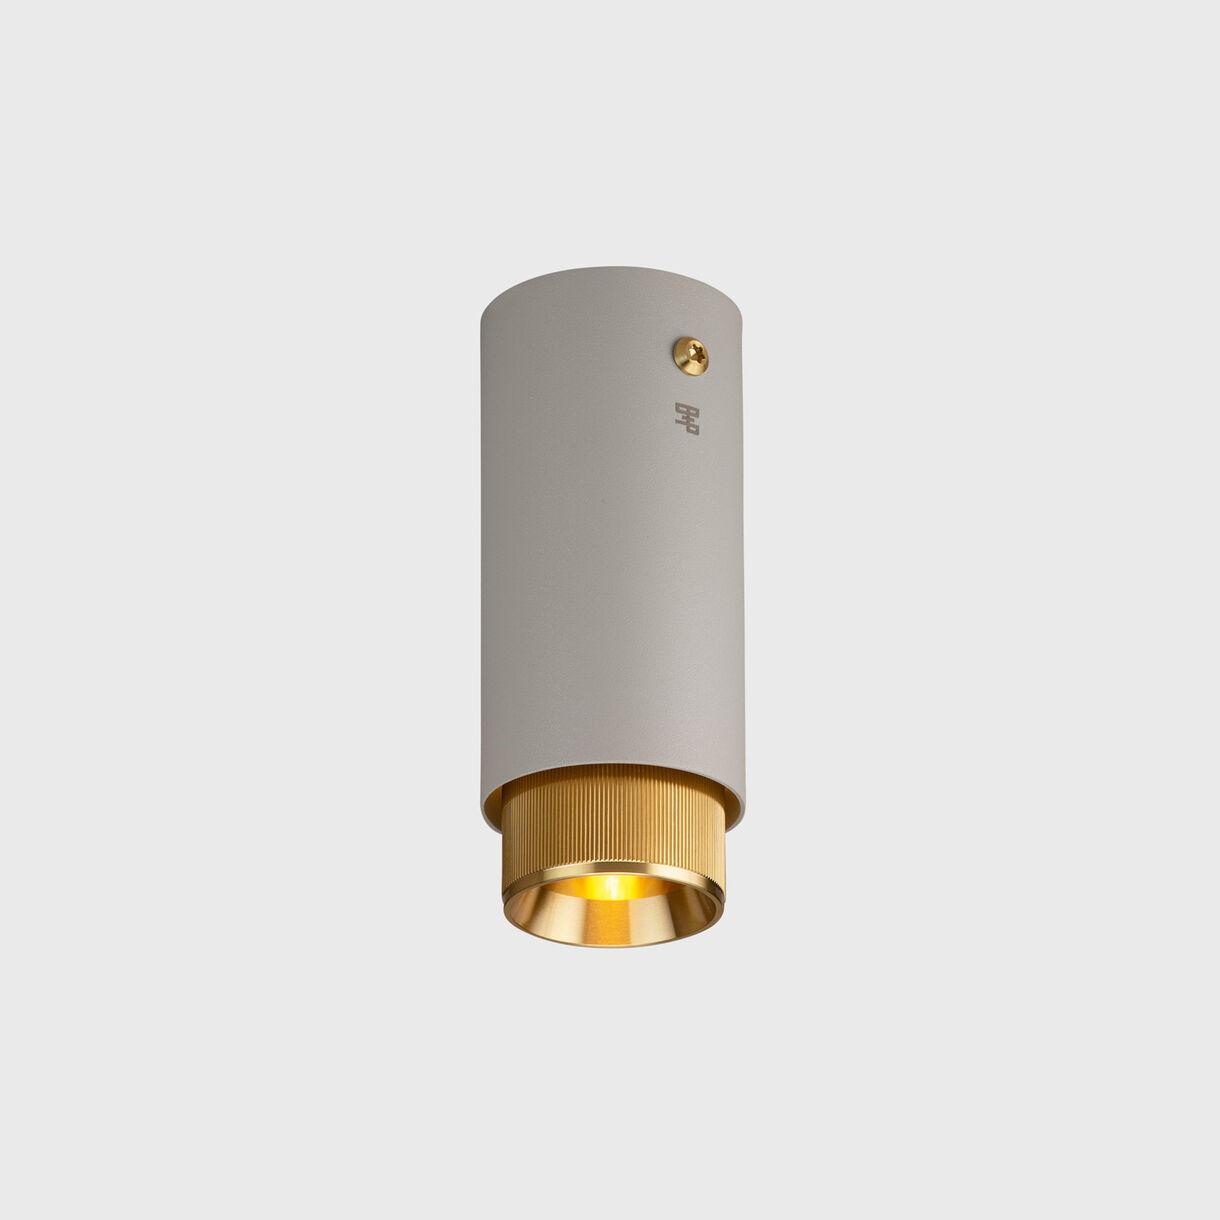 Exhaust Surface Light, Stone & Brass